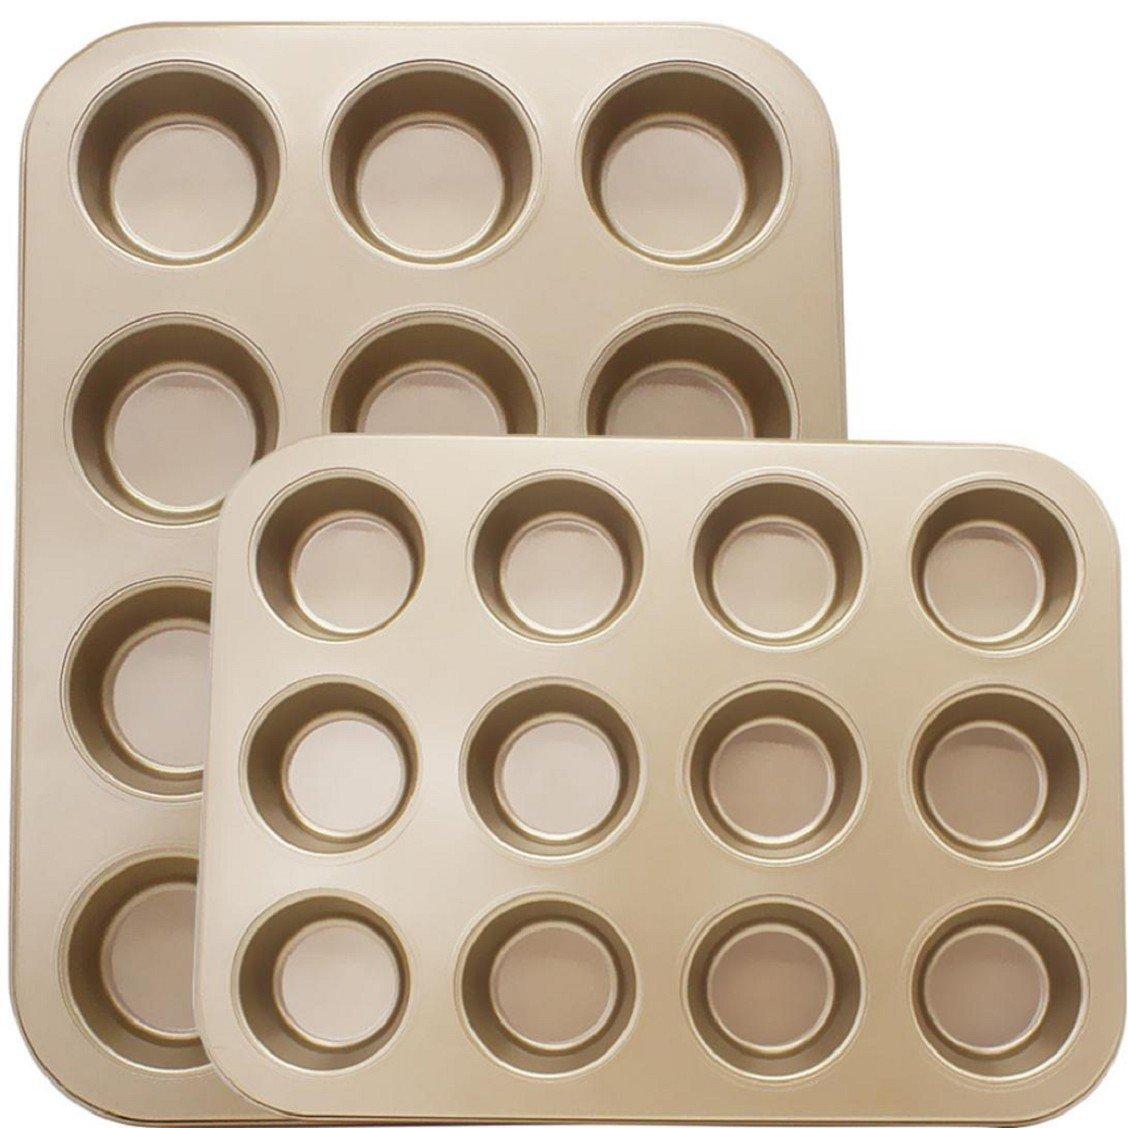 Naladoo 12 Cups Mini Muffin Bun Cupcake Baking Bakeware Mould Tray Pan/mold Kitchen,Freezer and Dishwasher Safe